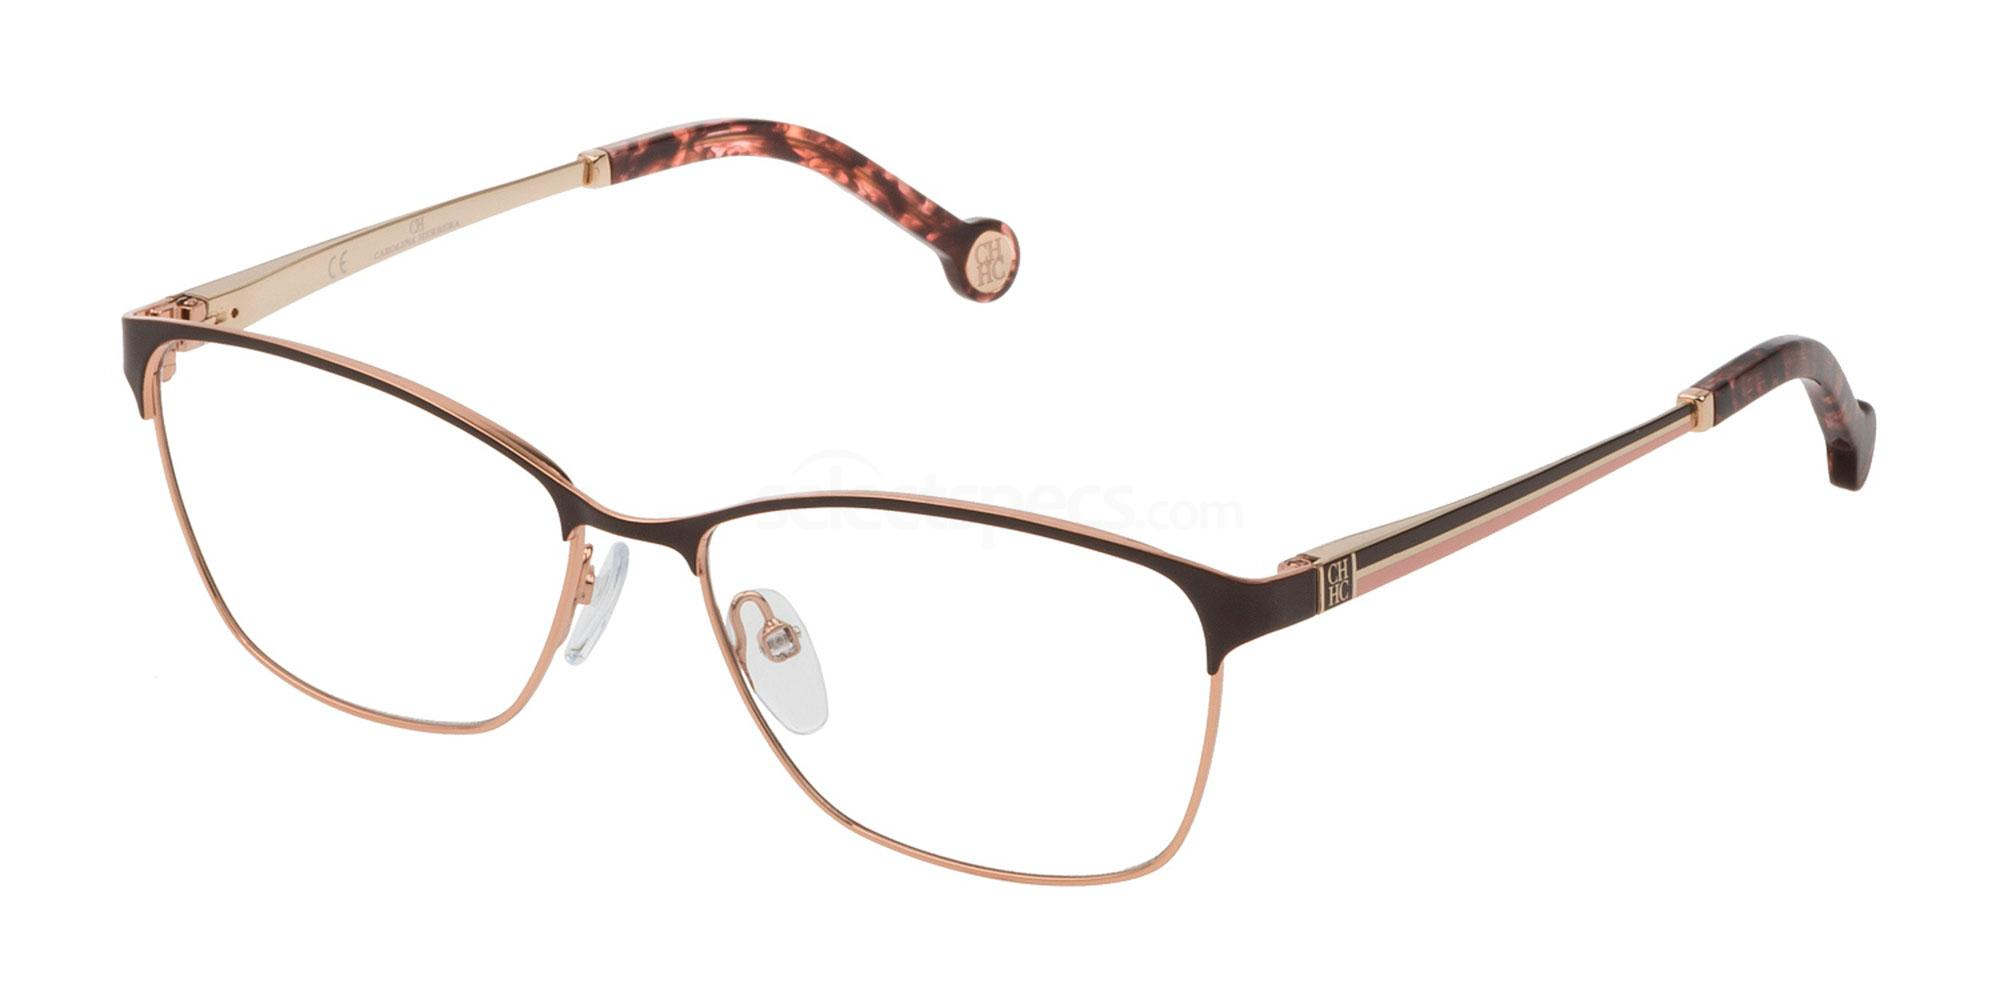 0287 VHE125 Glasses, CH Carolina Herrera